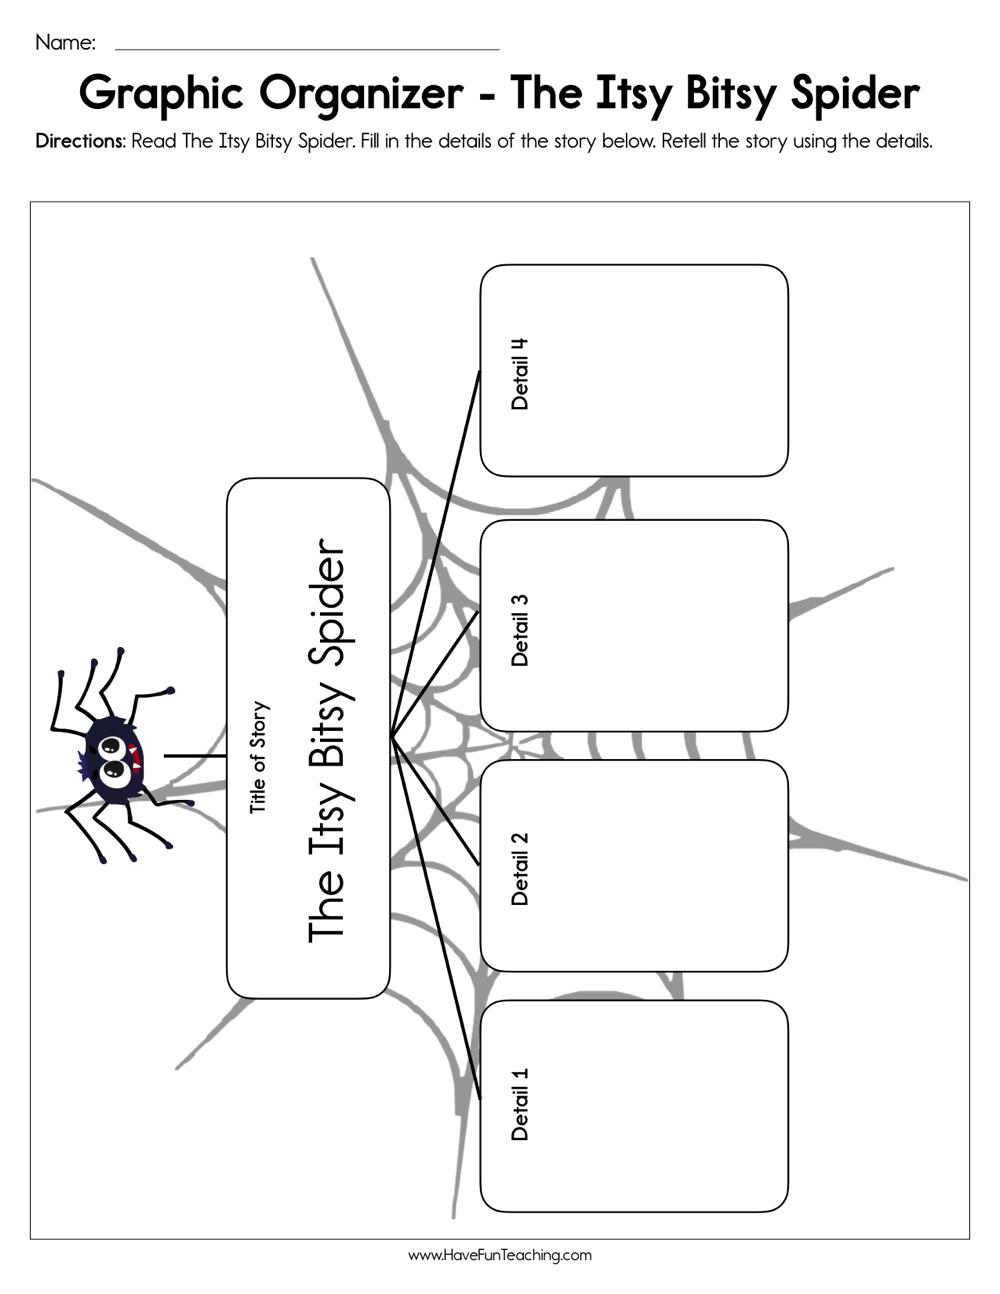 The Itsy Bitsy Spider Graphic Organizer Worksheet | Have ...